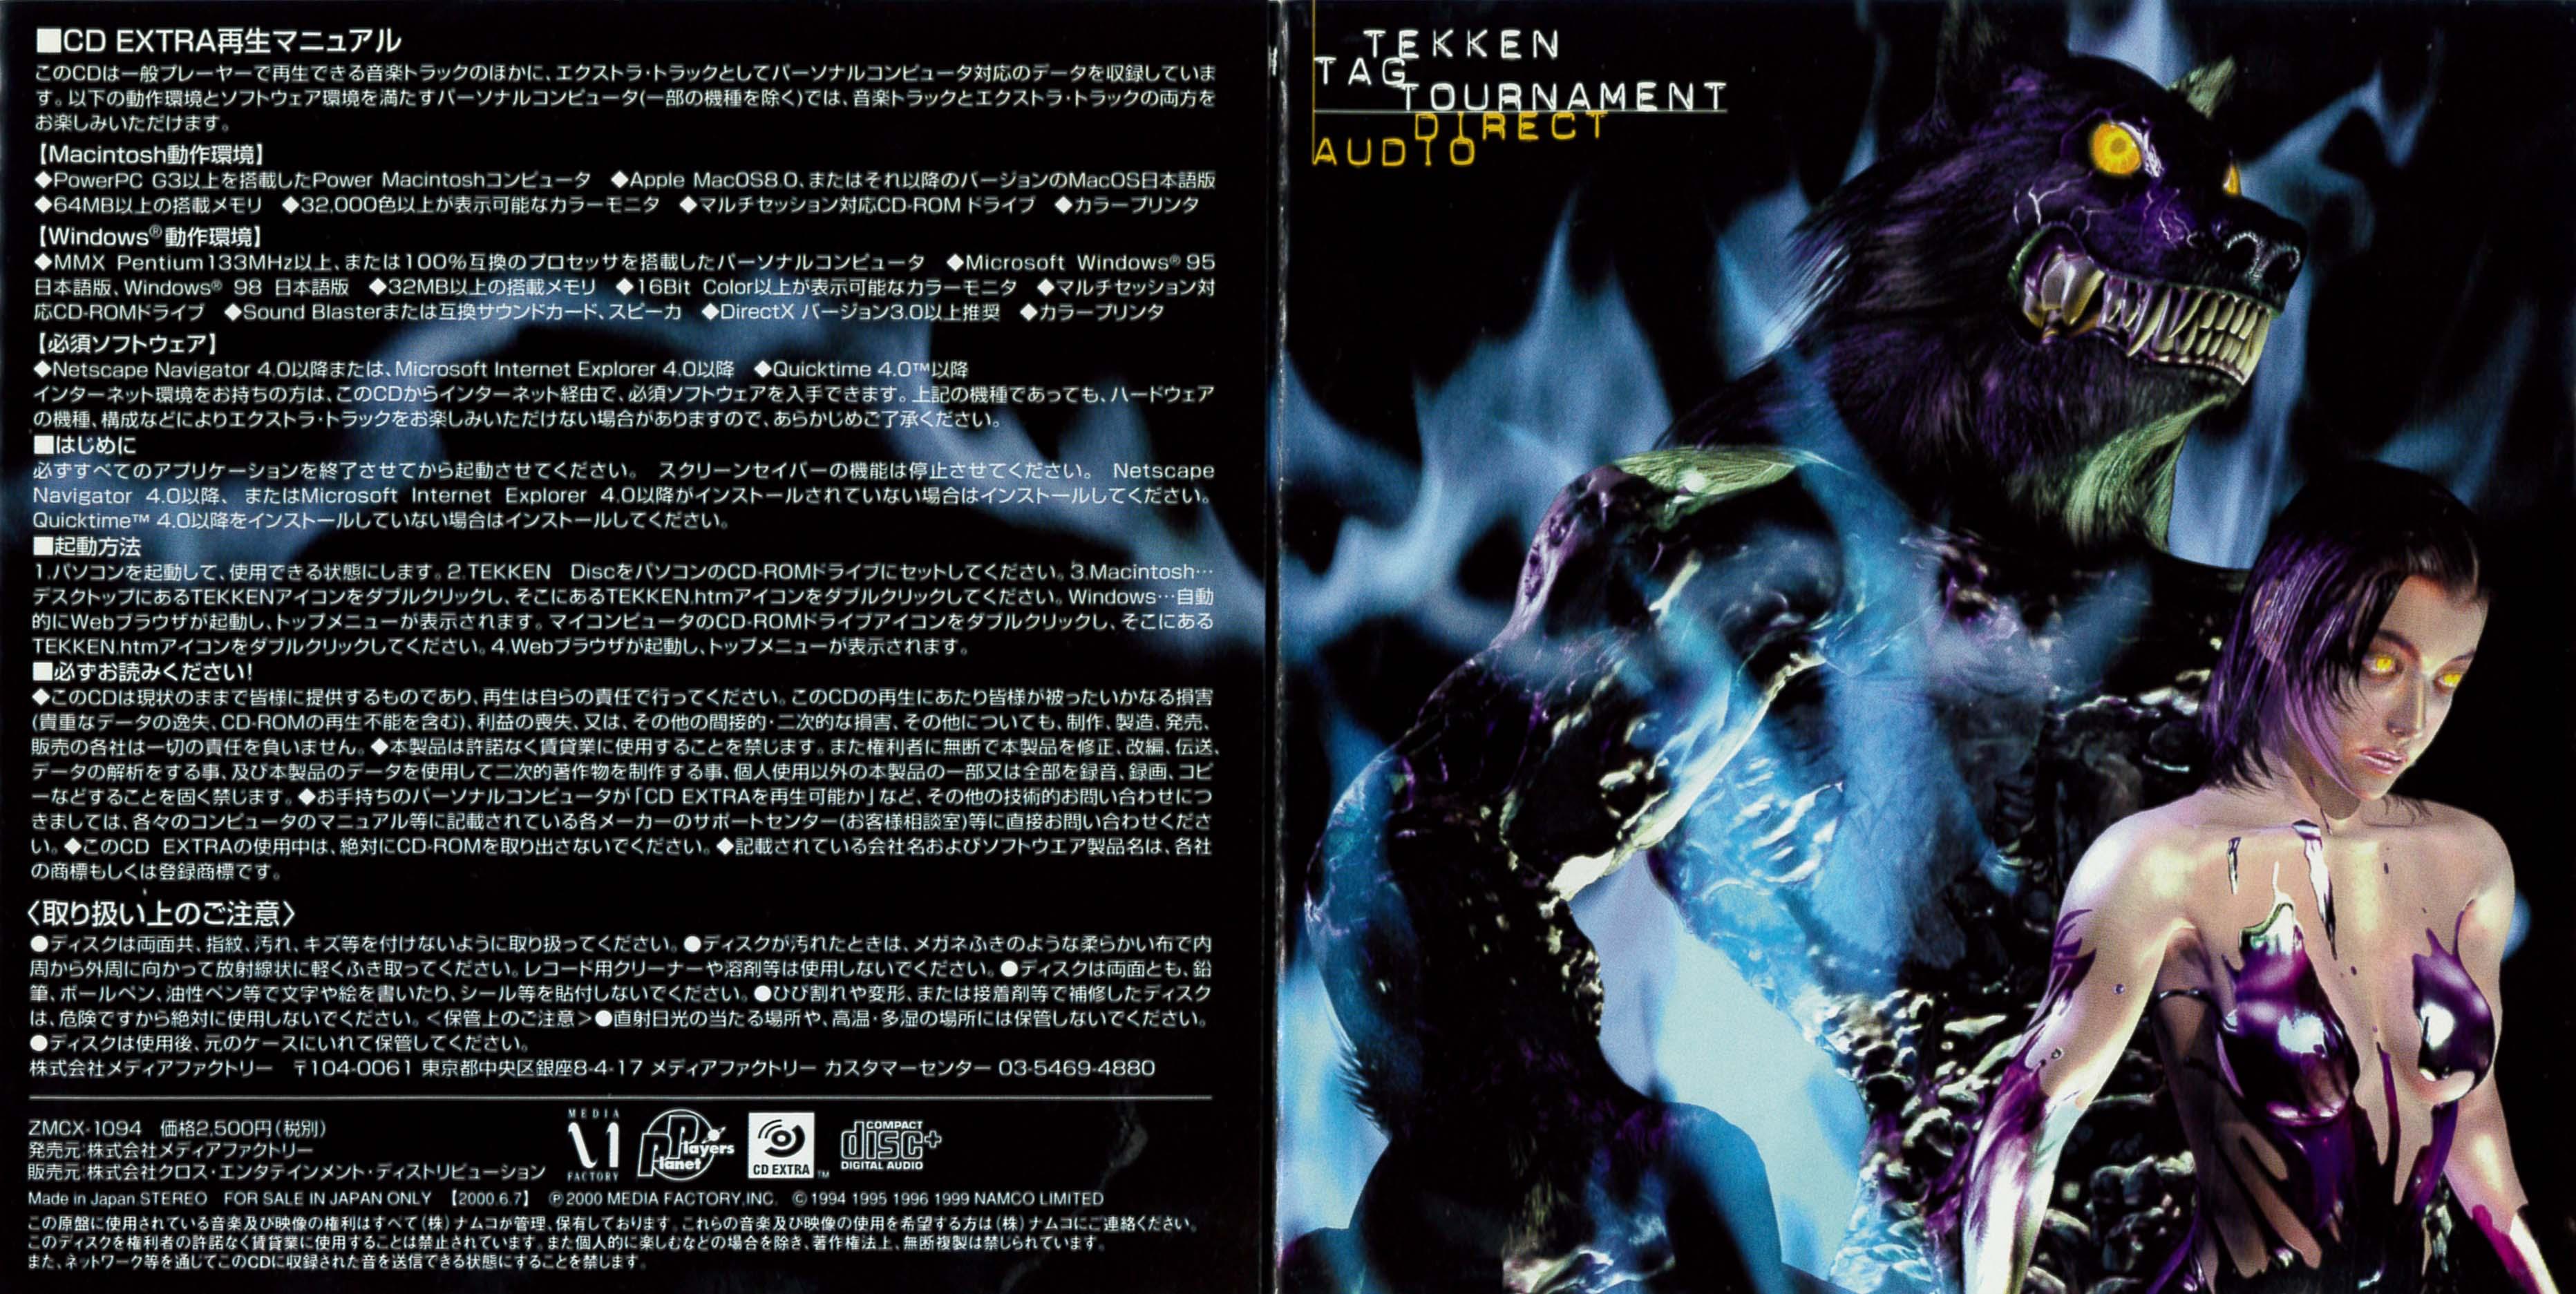 Tekken Tag Tournament Direct Audio Mp3 Download Tekken Tag Tournament Direct Audio Soundtracks For Free